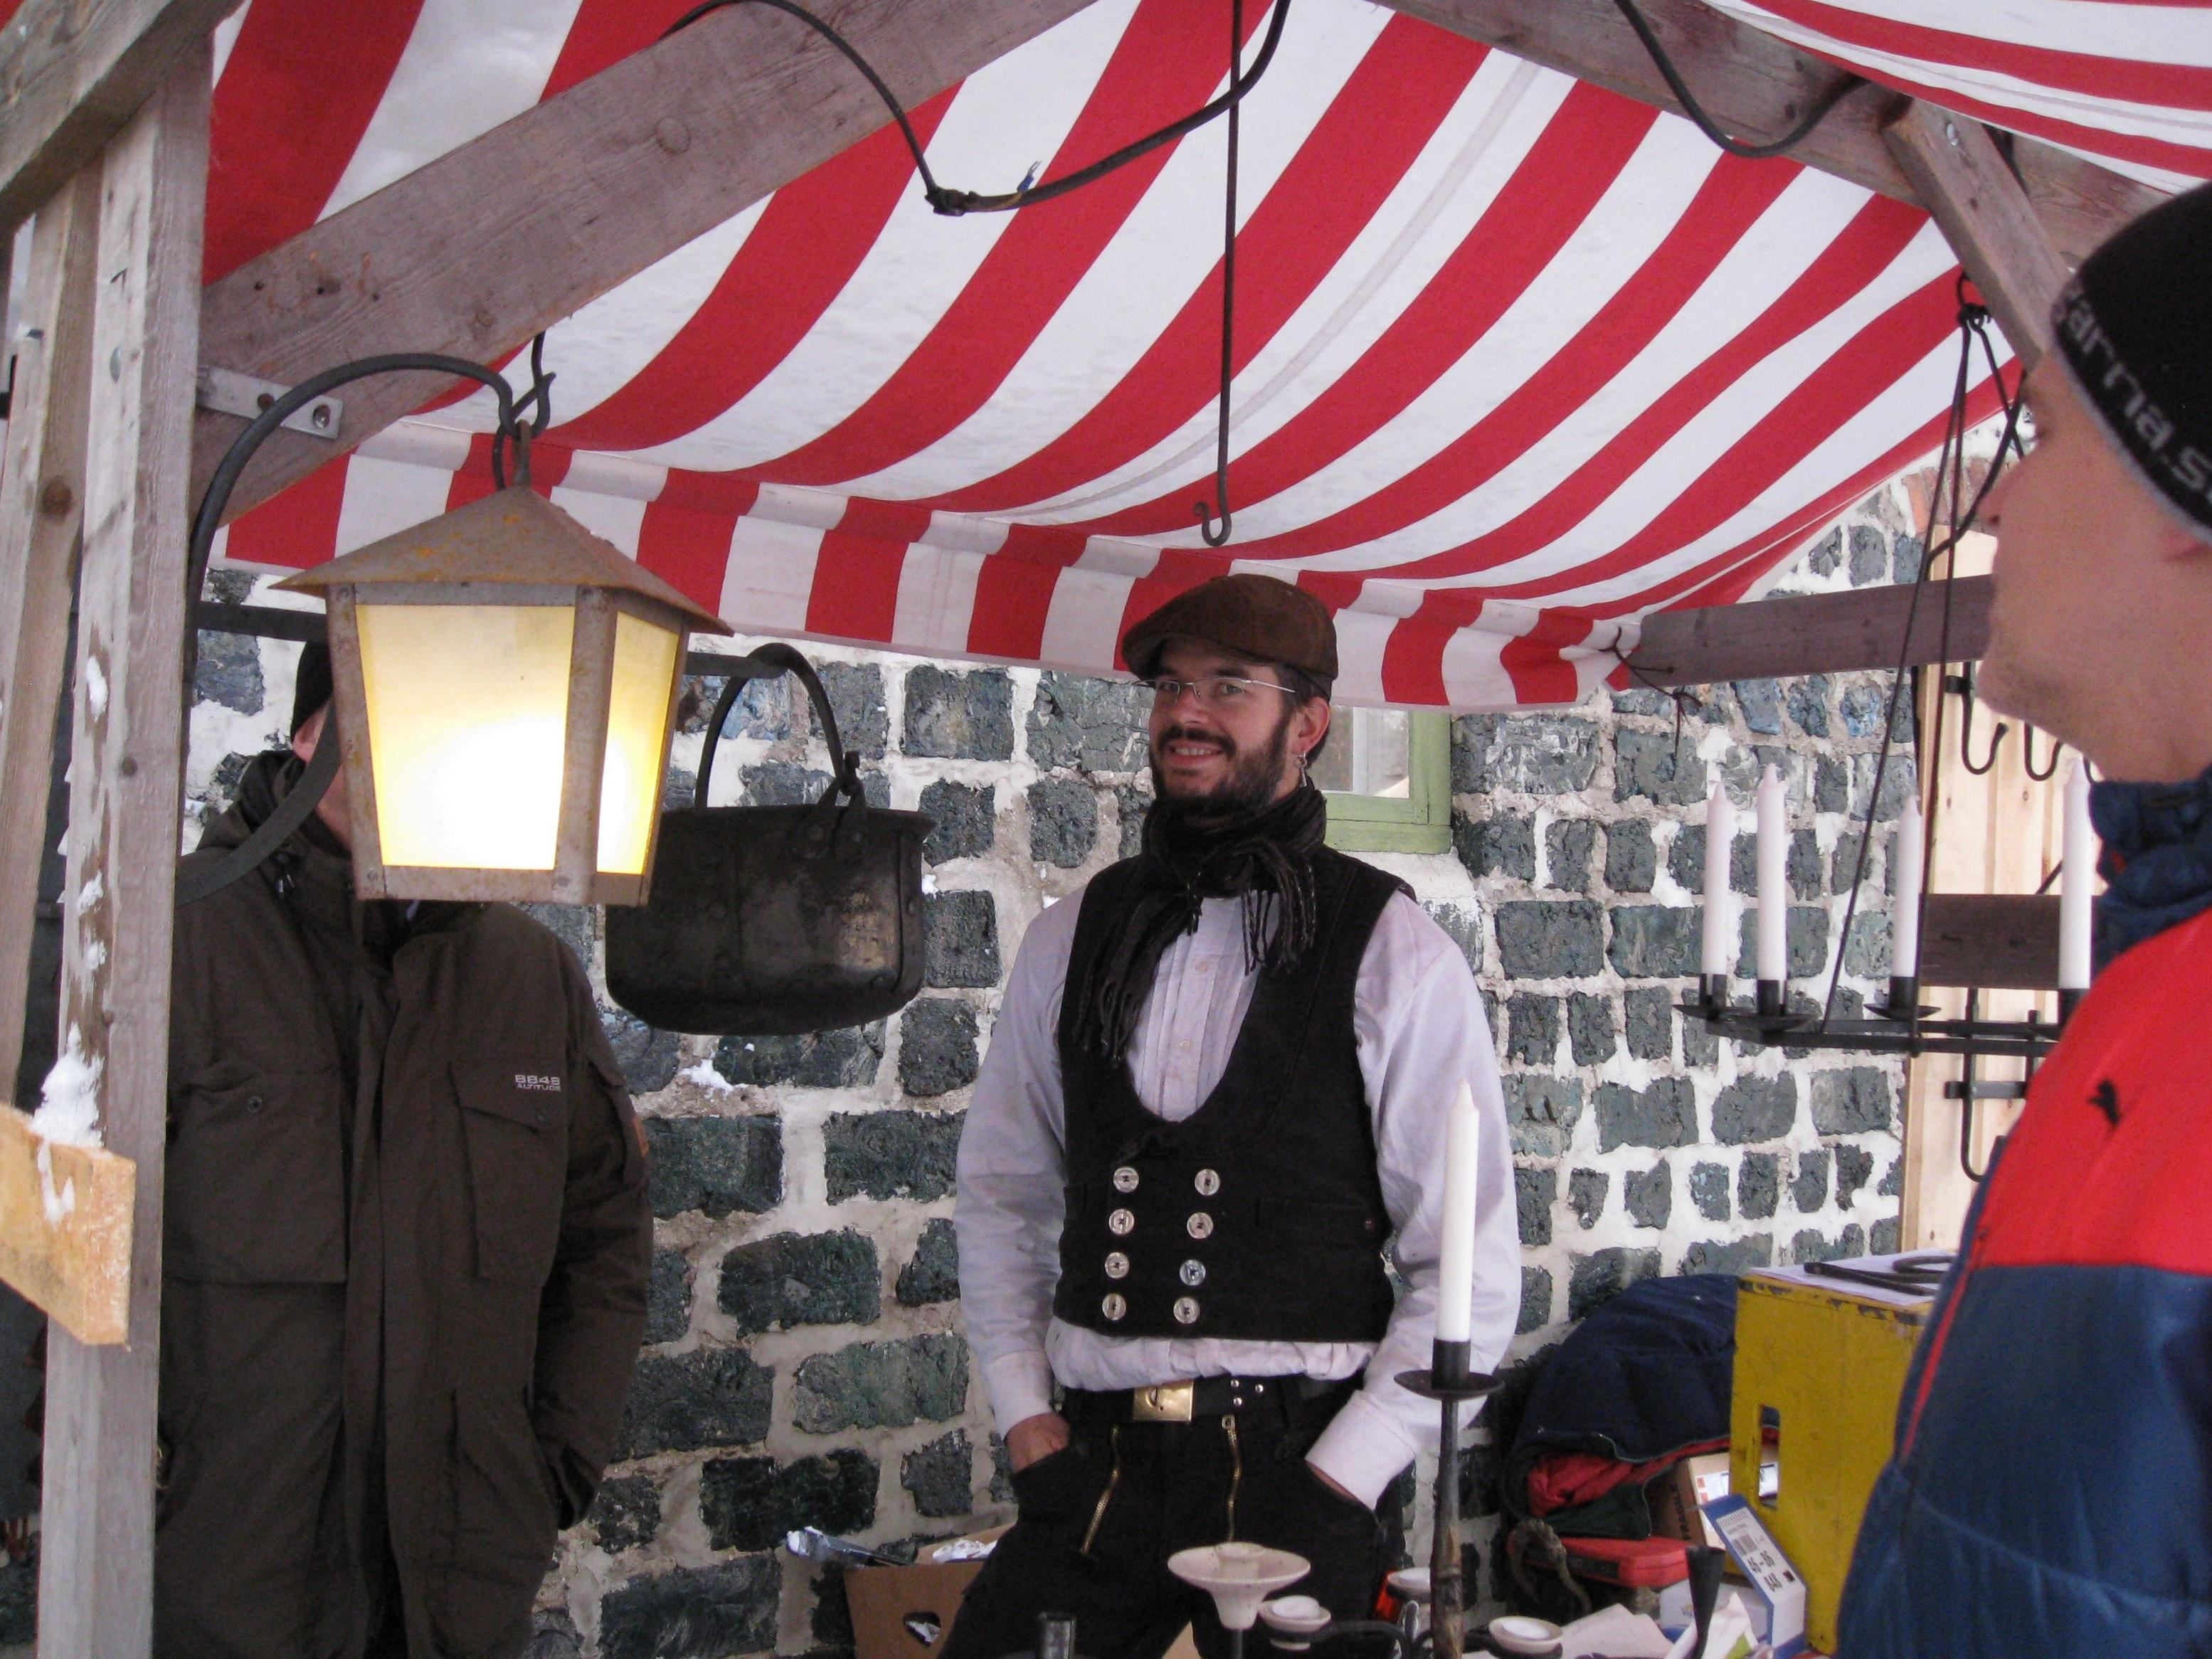 Traditional Christmas Market at Olofsfors Bruk